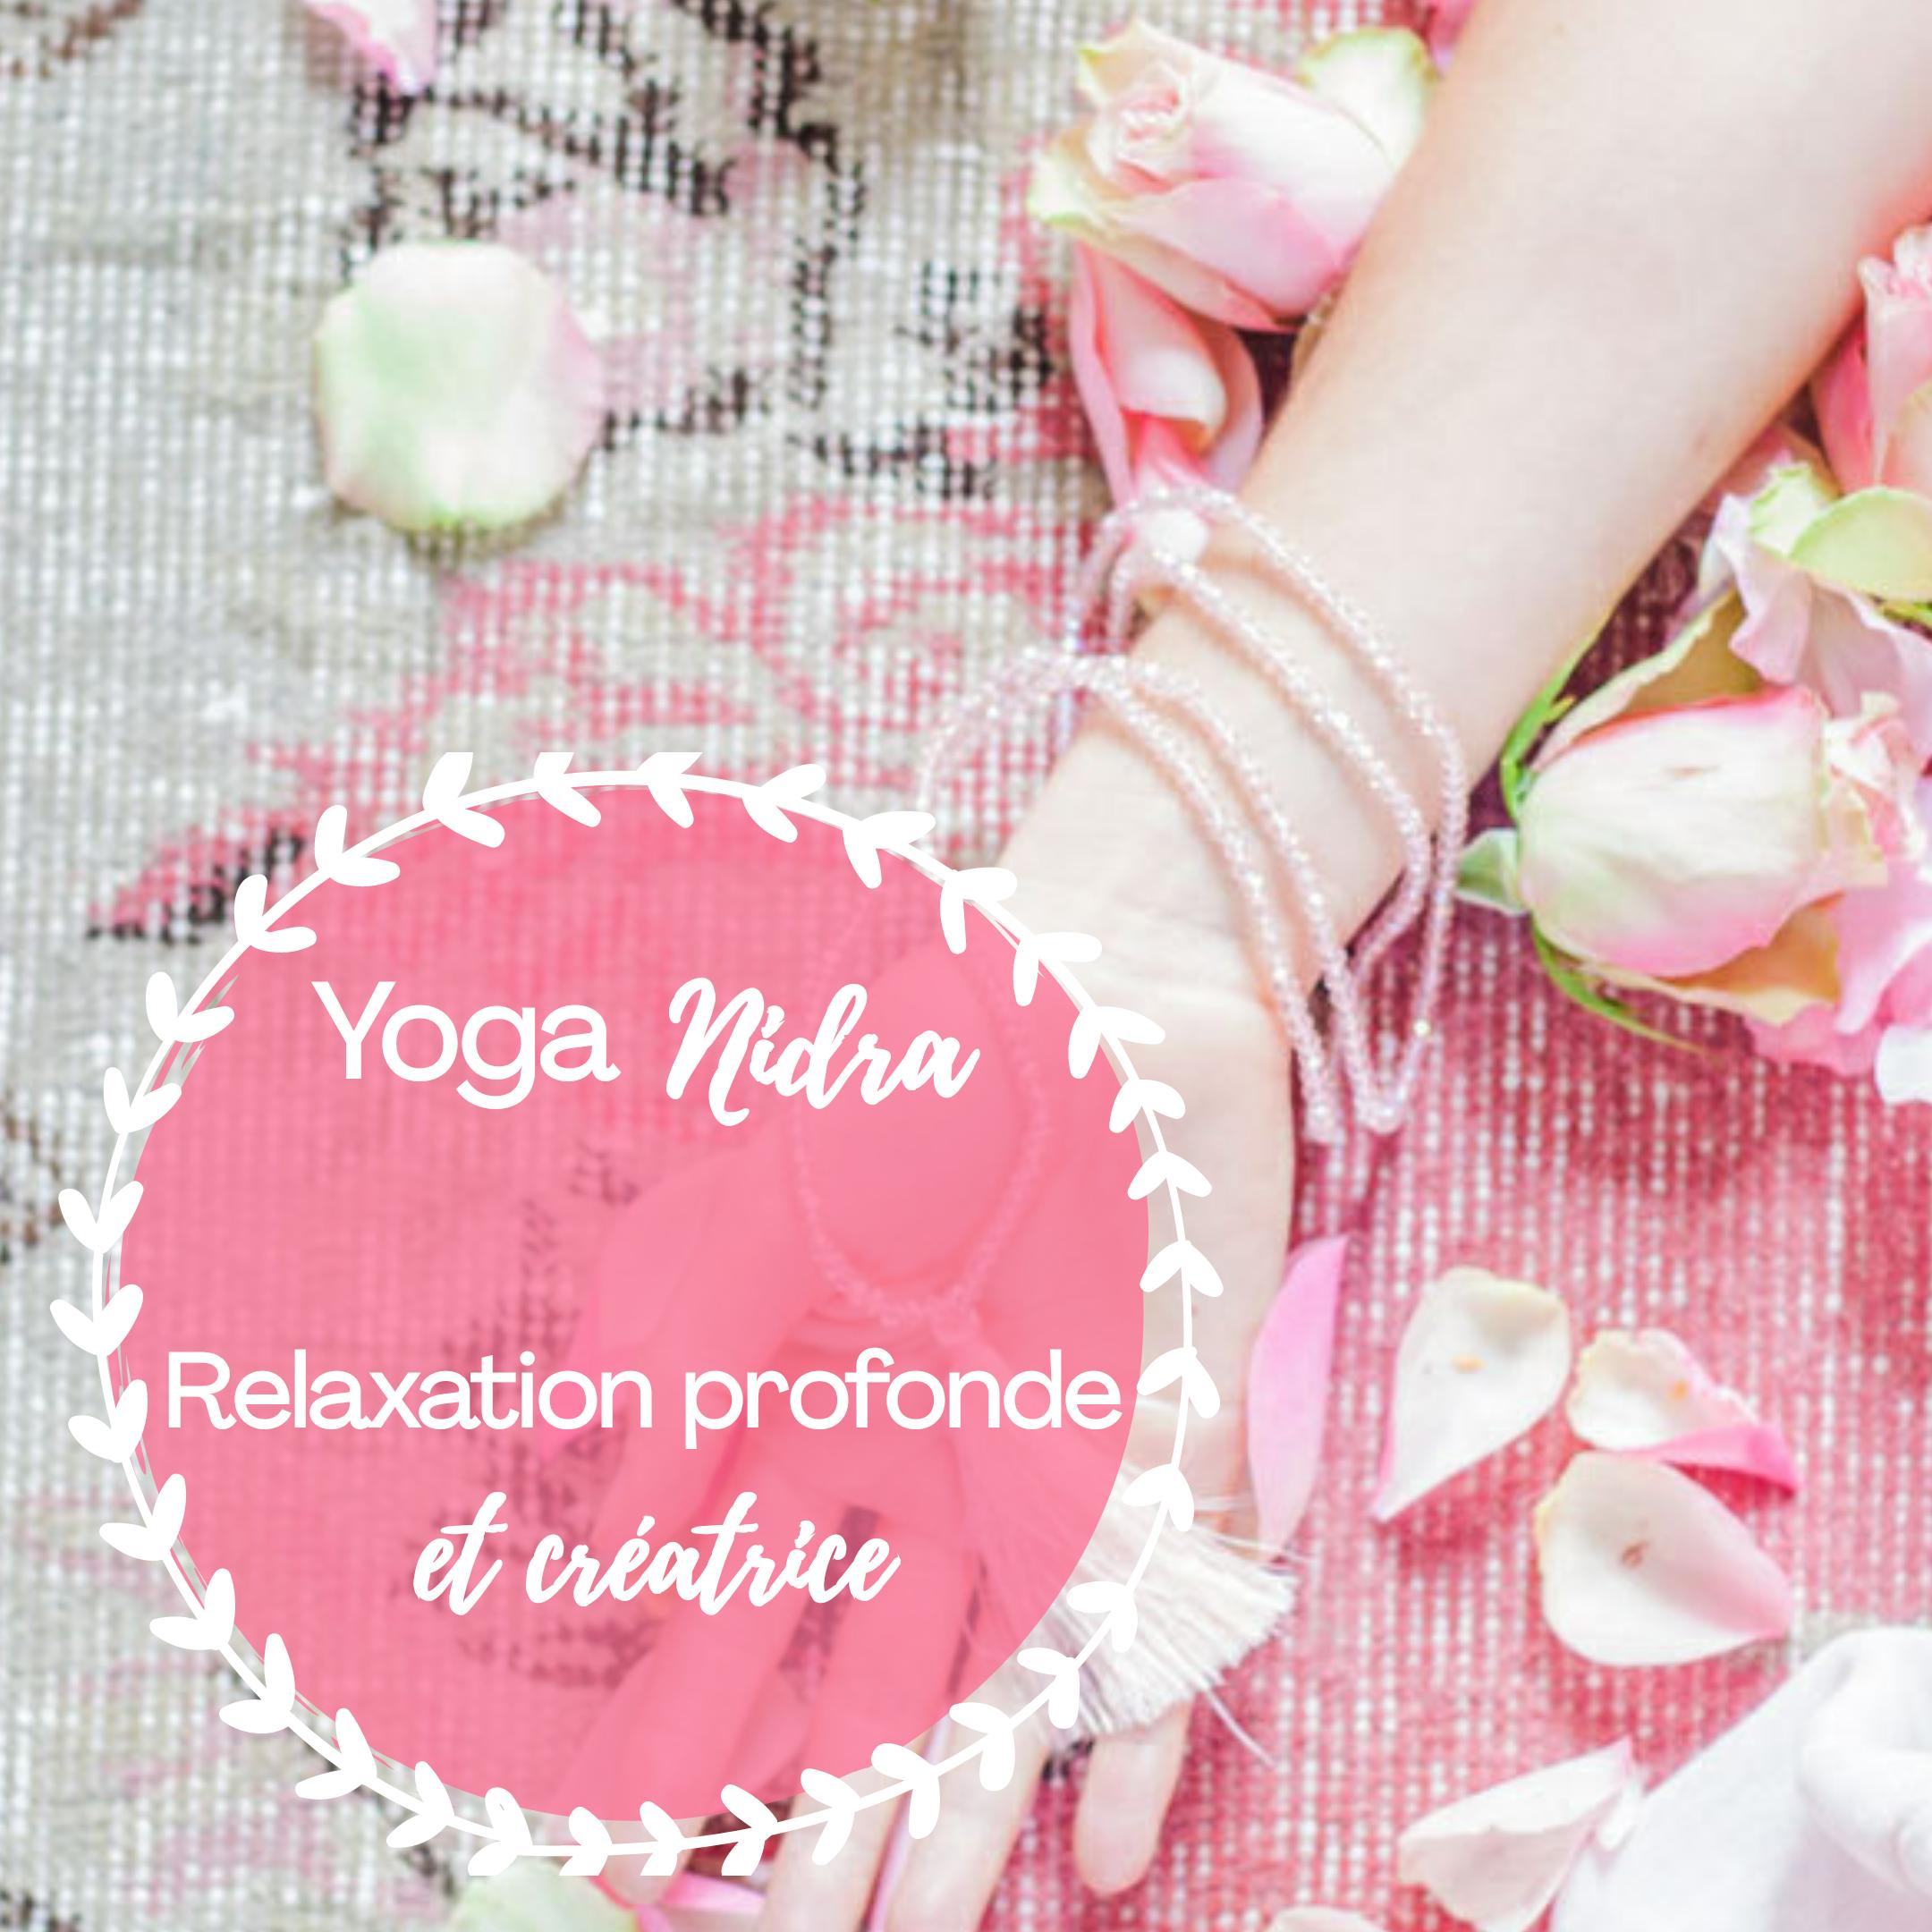 Yoga nidra syvie thaon coach relaxation meditation intention creatrice pouvoir